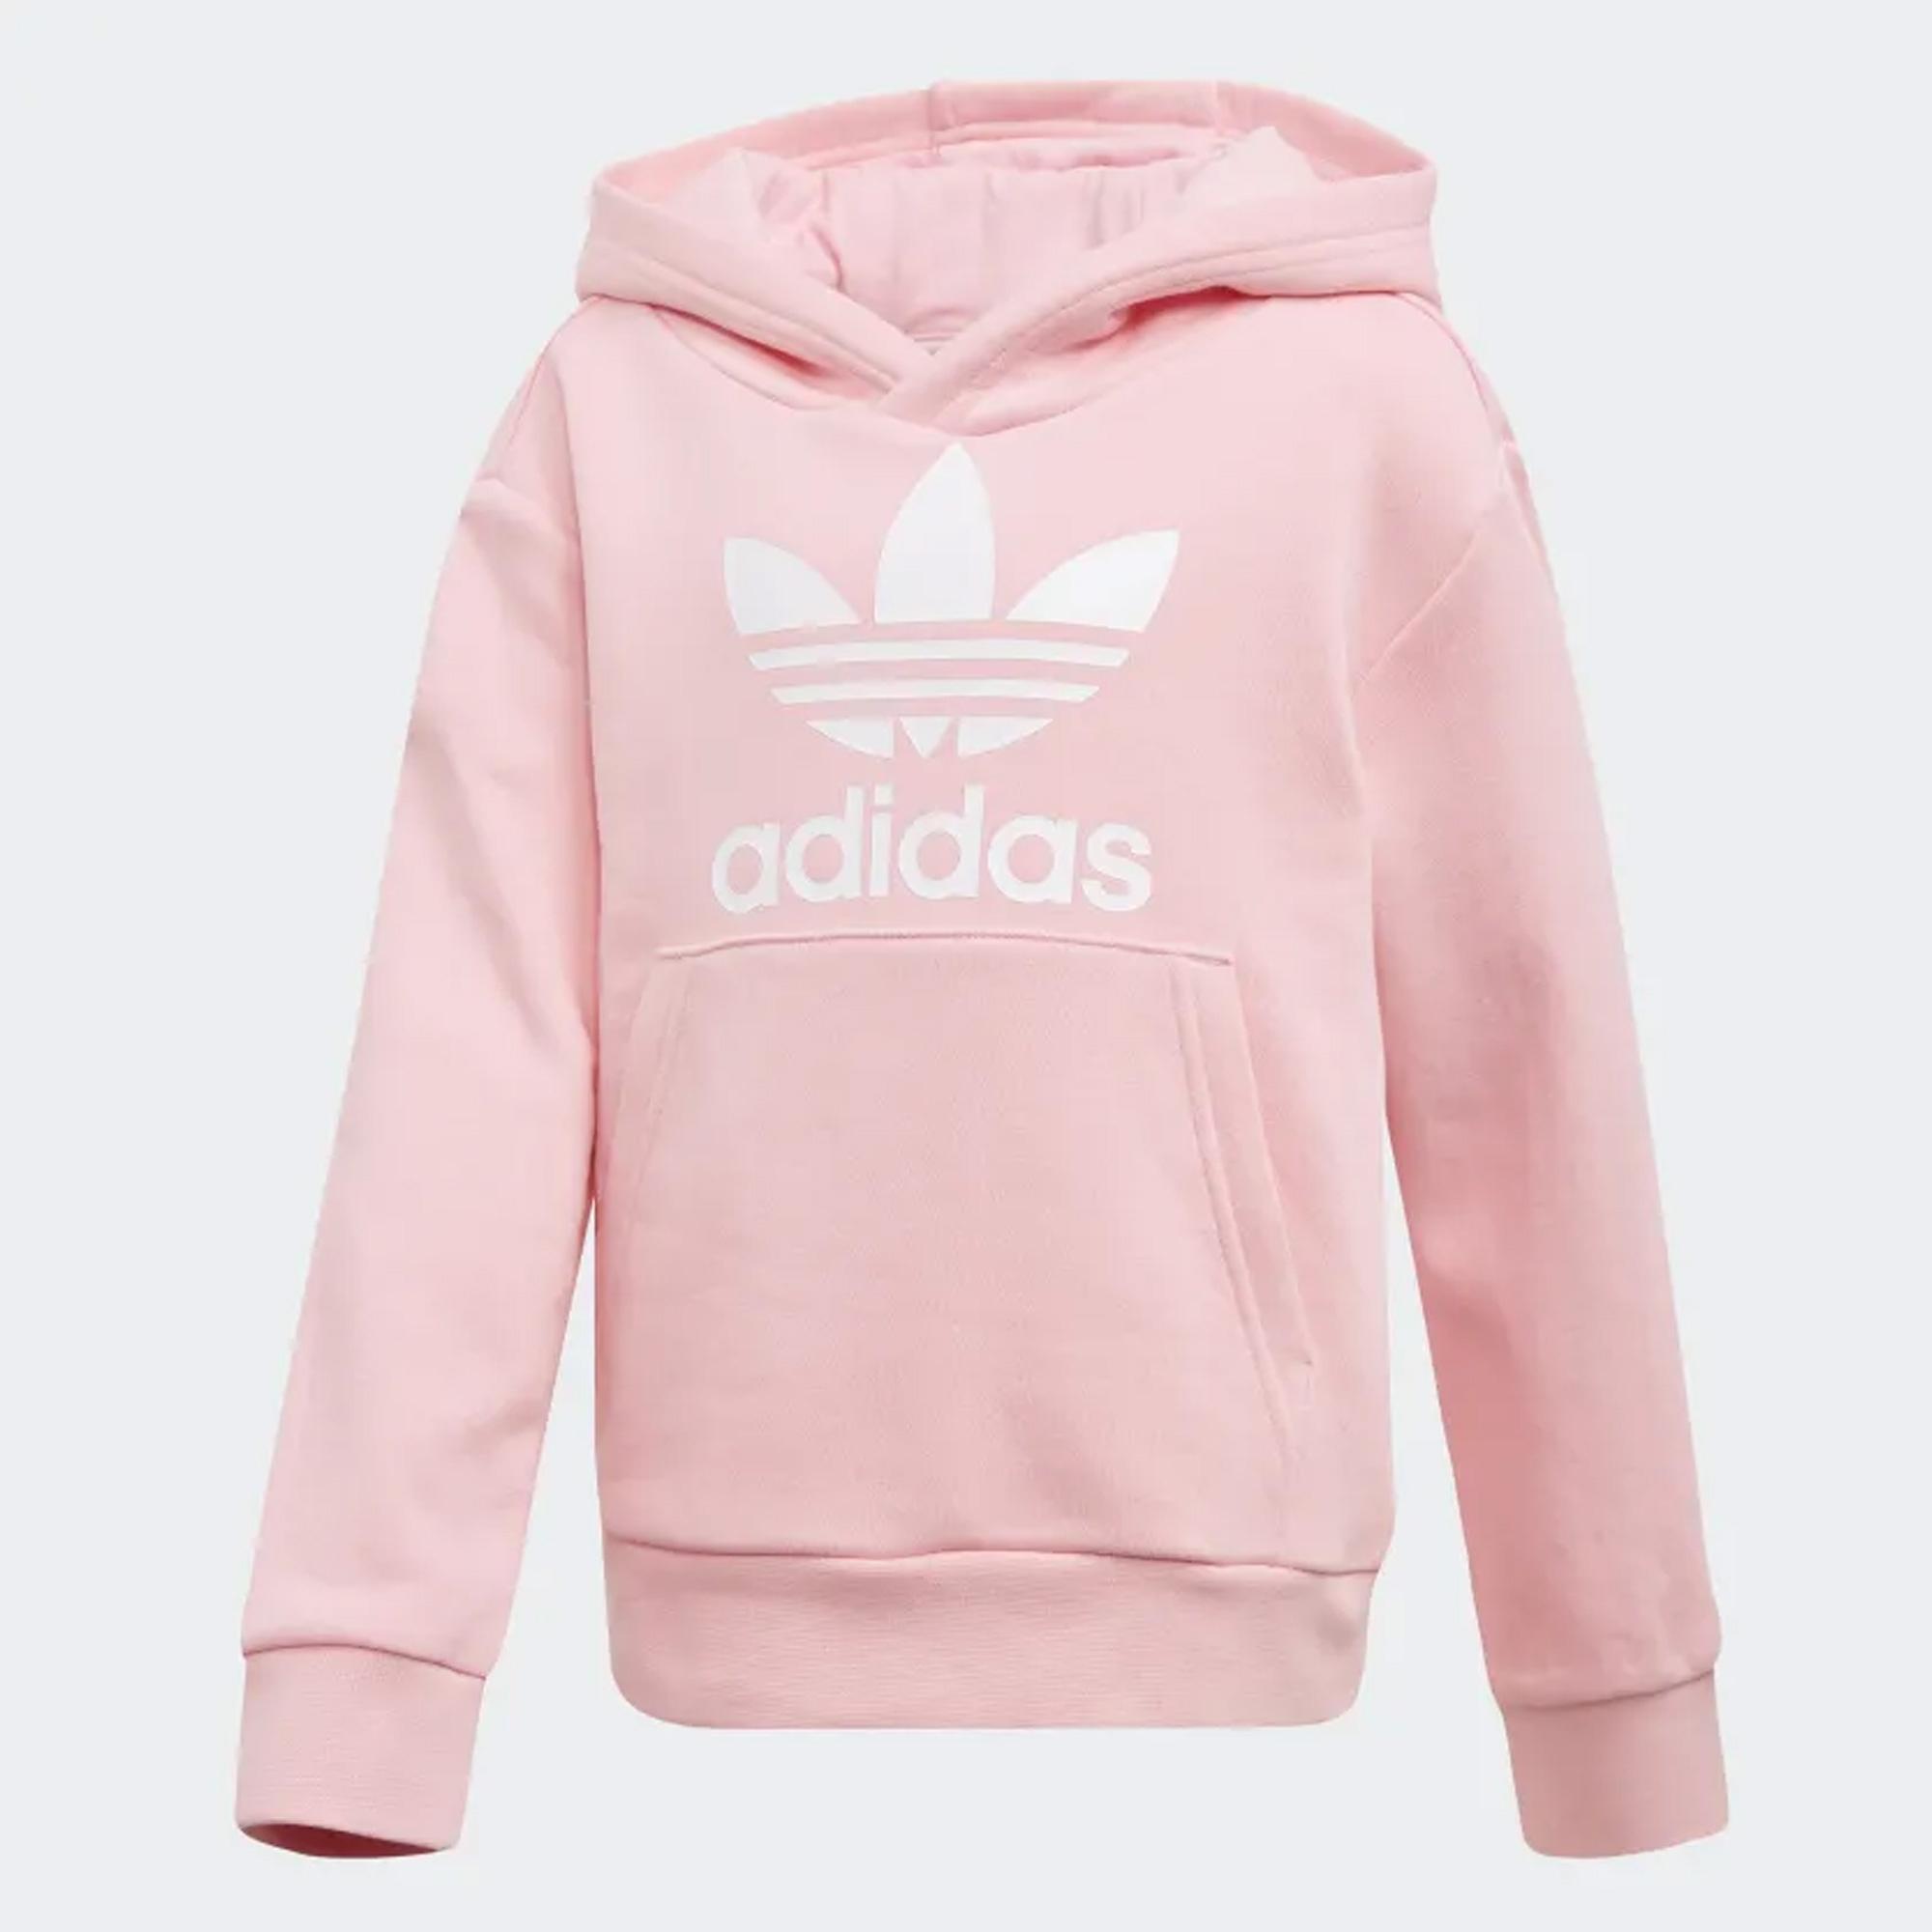 ac78191fbf Trefoil Hoodie Set - Light Pink & White